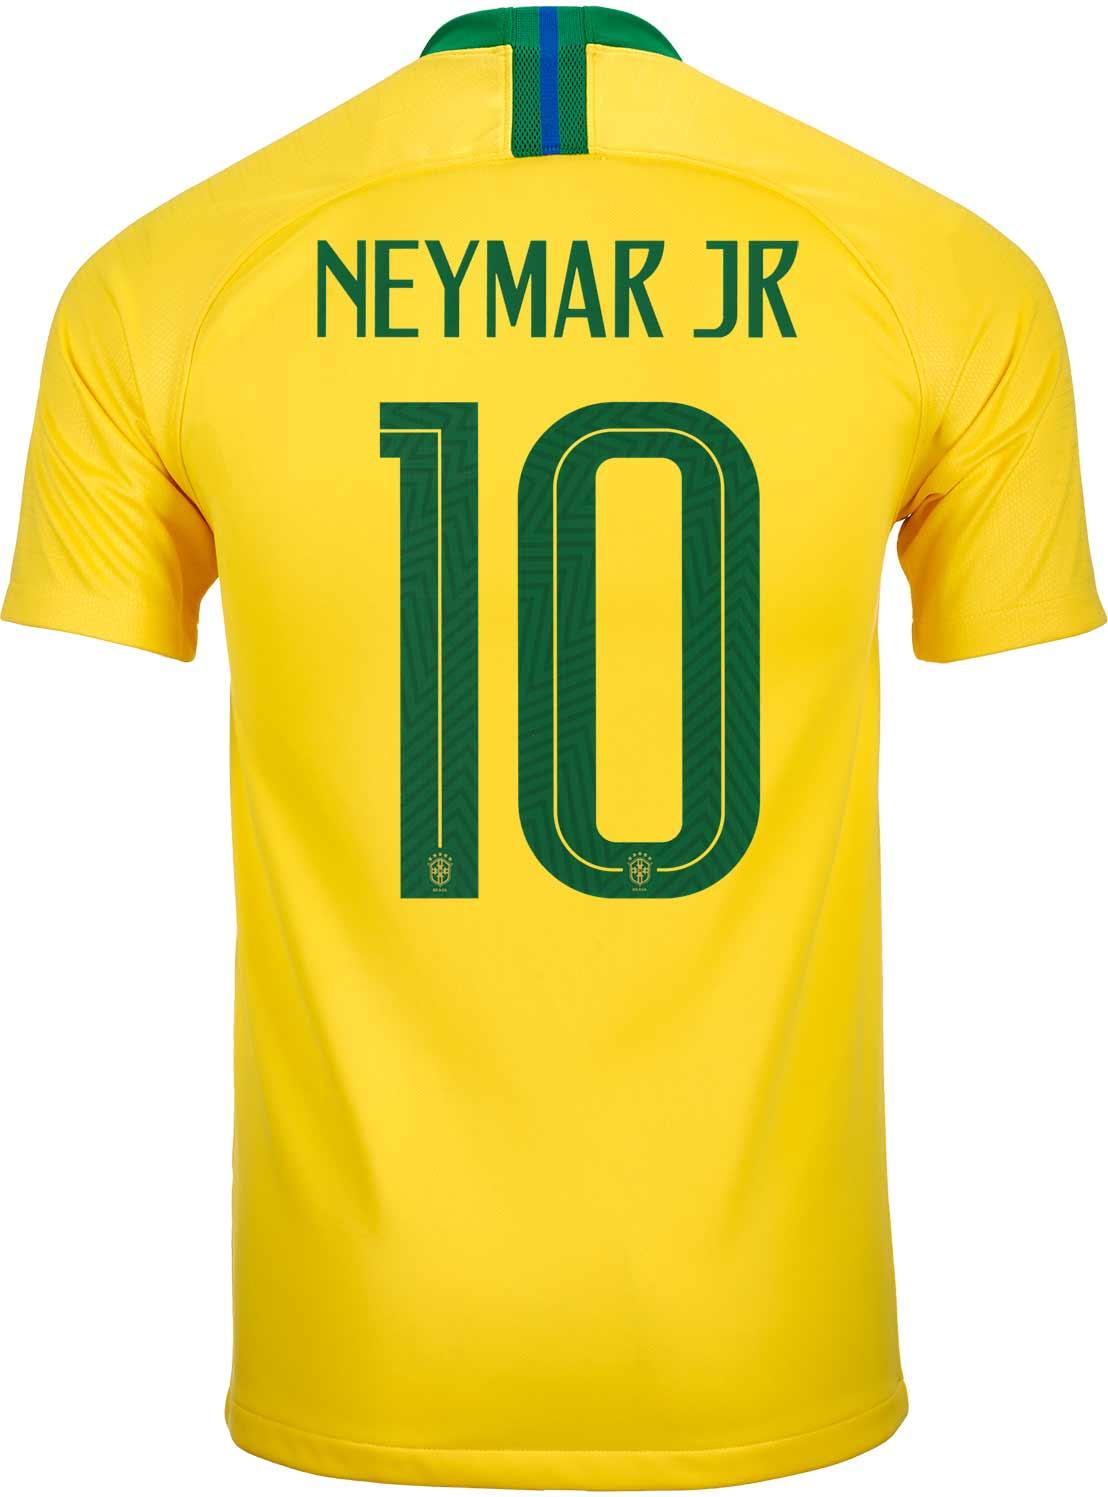 1d2c4084a78 2018 19 Kids Nike Neymar Jr Brazil Home Jersey - SoccerPro